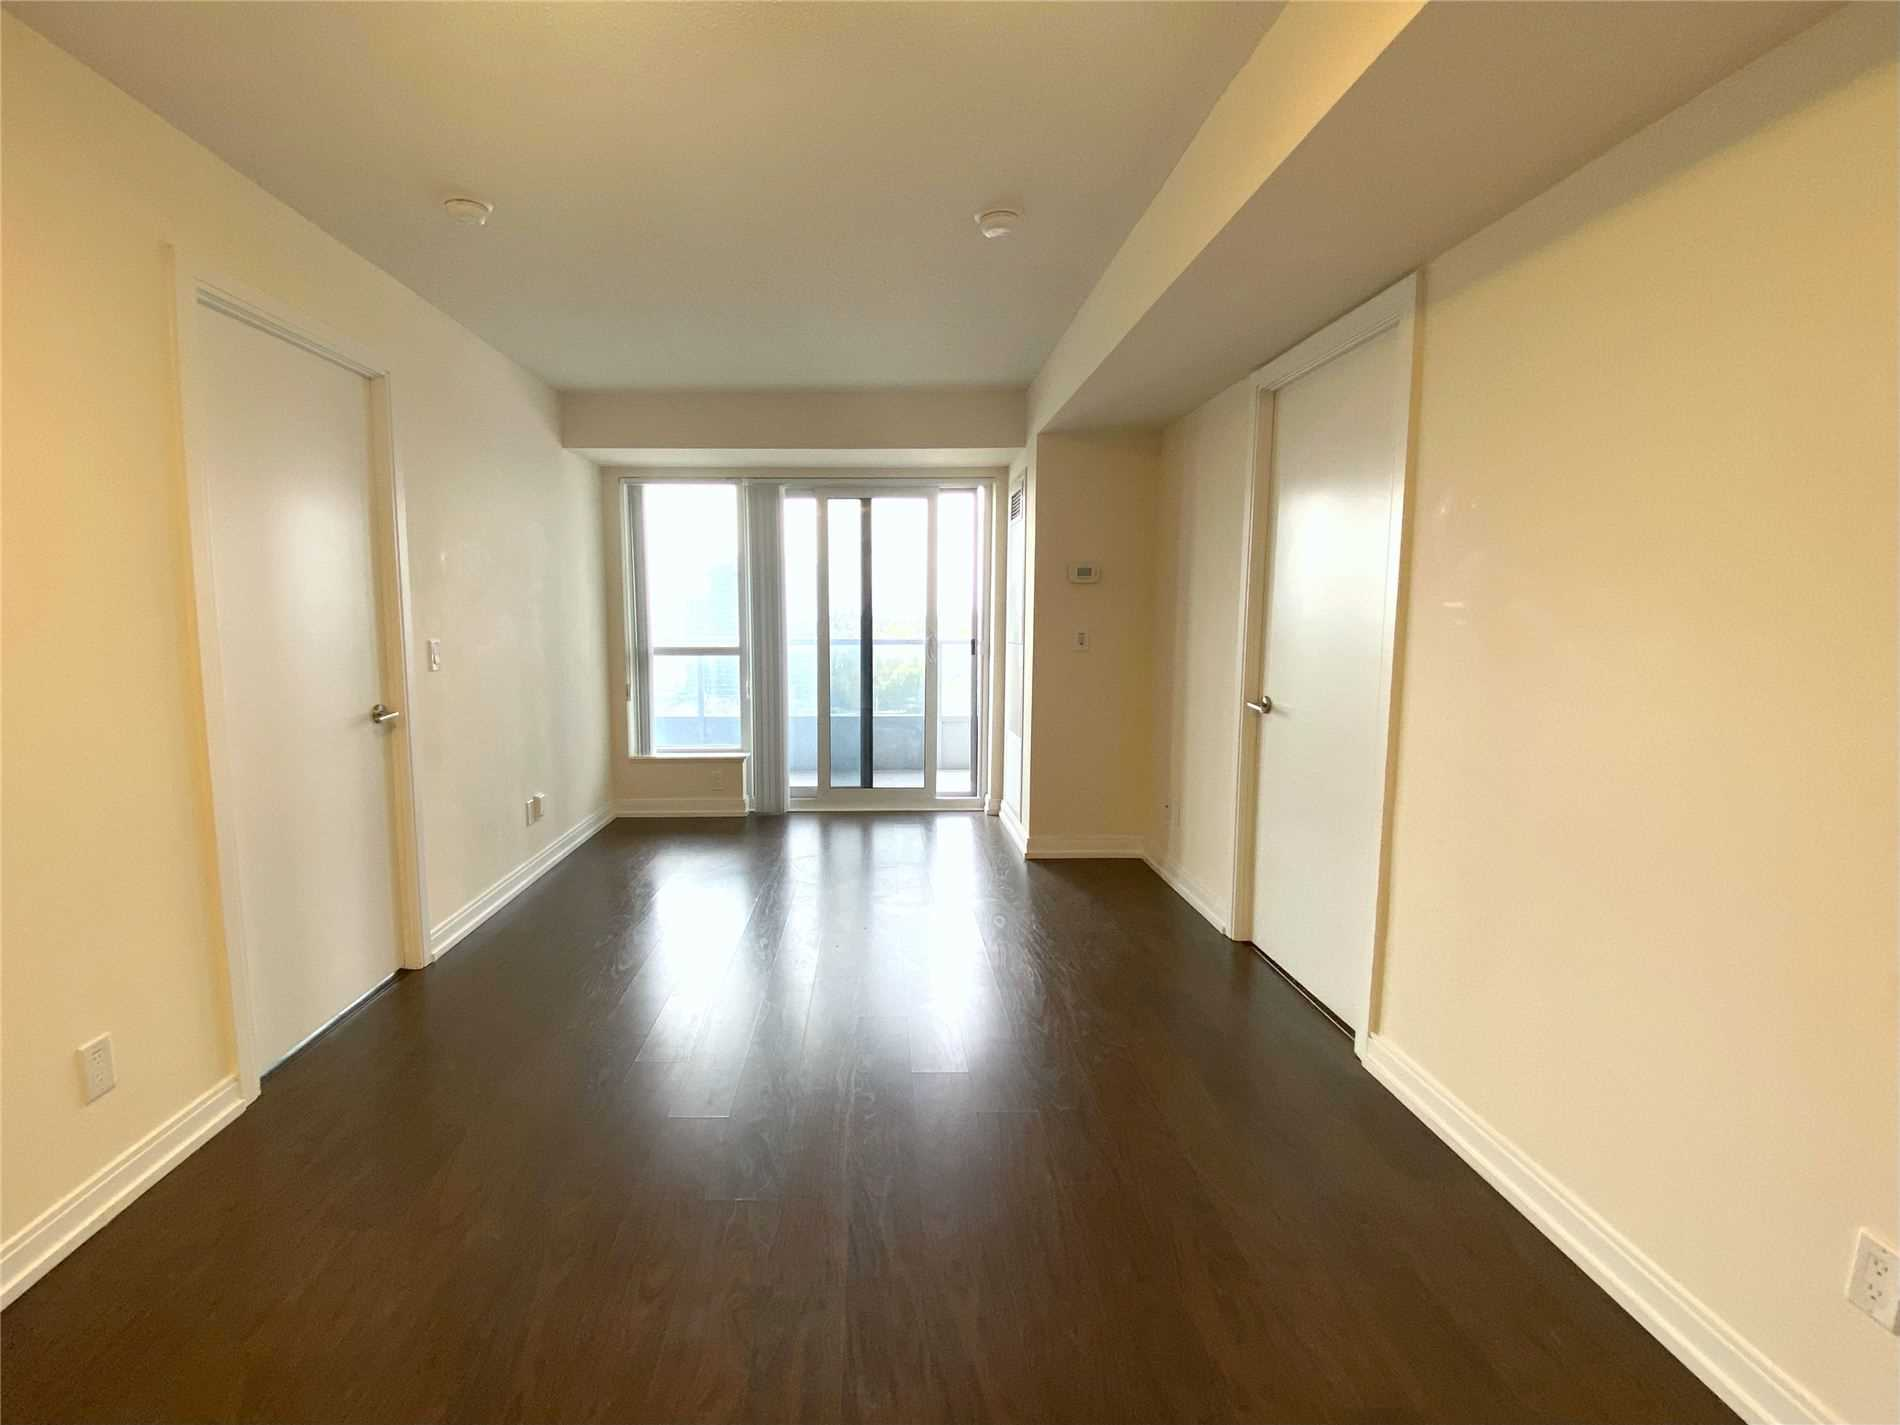 Condo Apt For Lease In Toronto , 2 Bedrooms Bedrooms, ,1 BathroomBathrooms,Condo Apt,For Lease,1518,Village Green